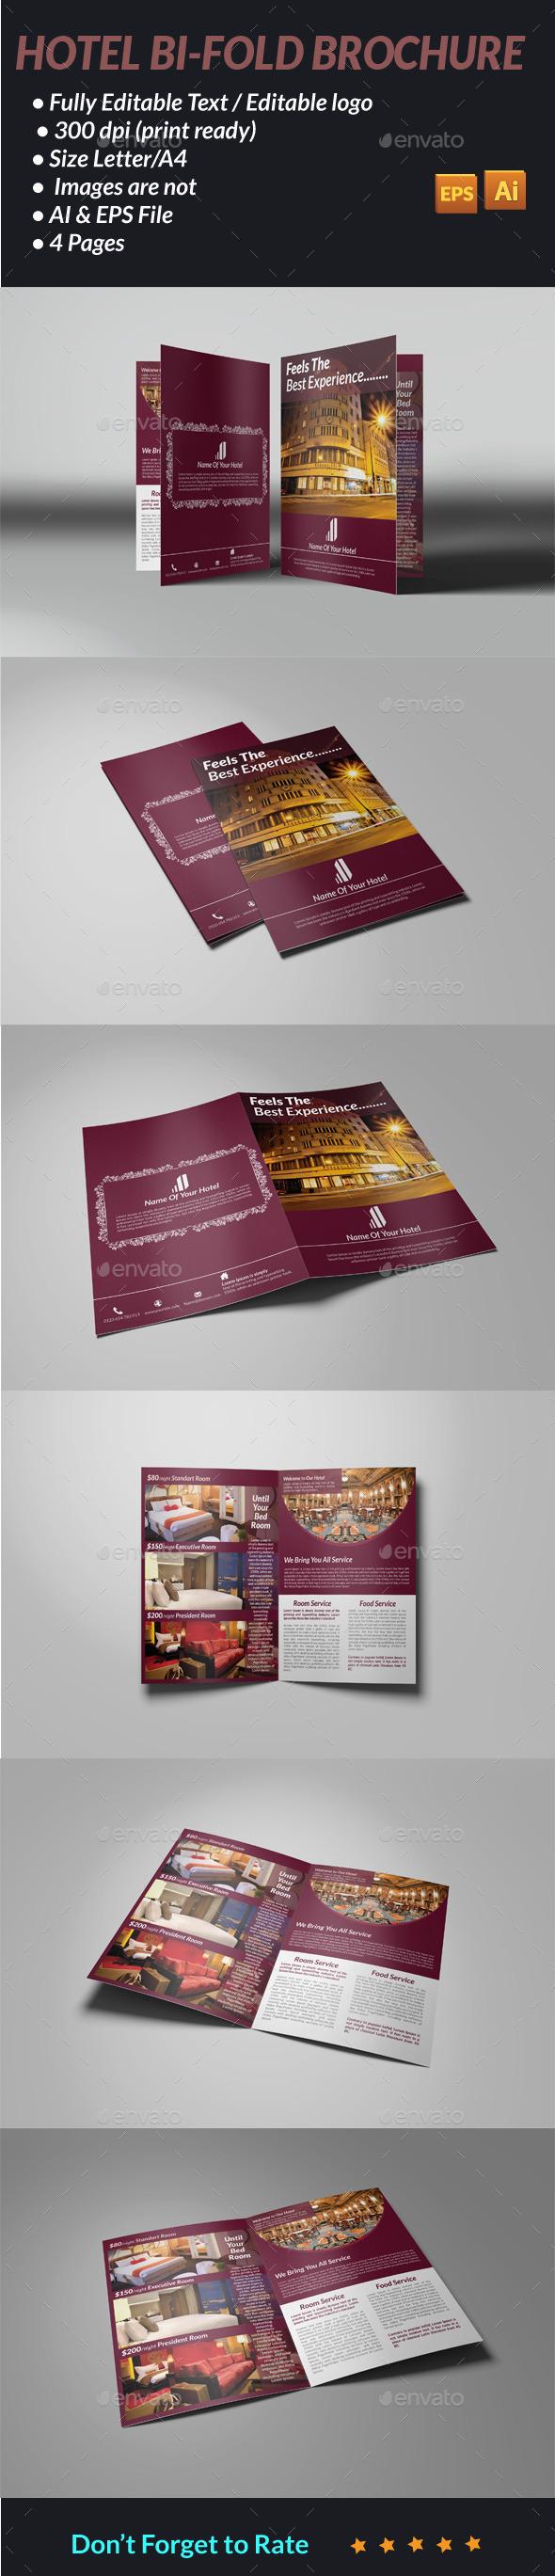 Hotel Bi-Fold Brochure - Brochures Print Templates